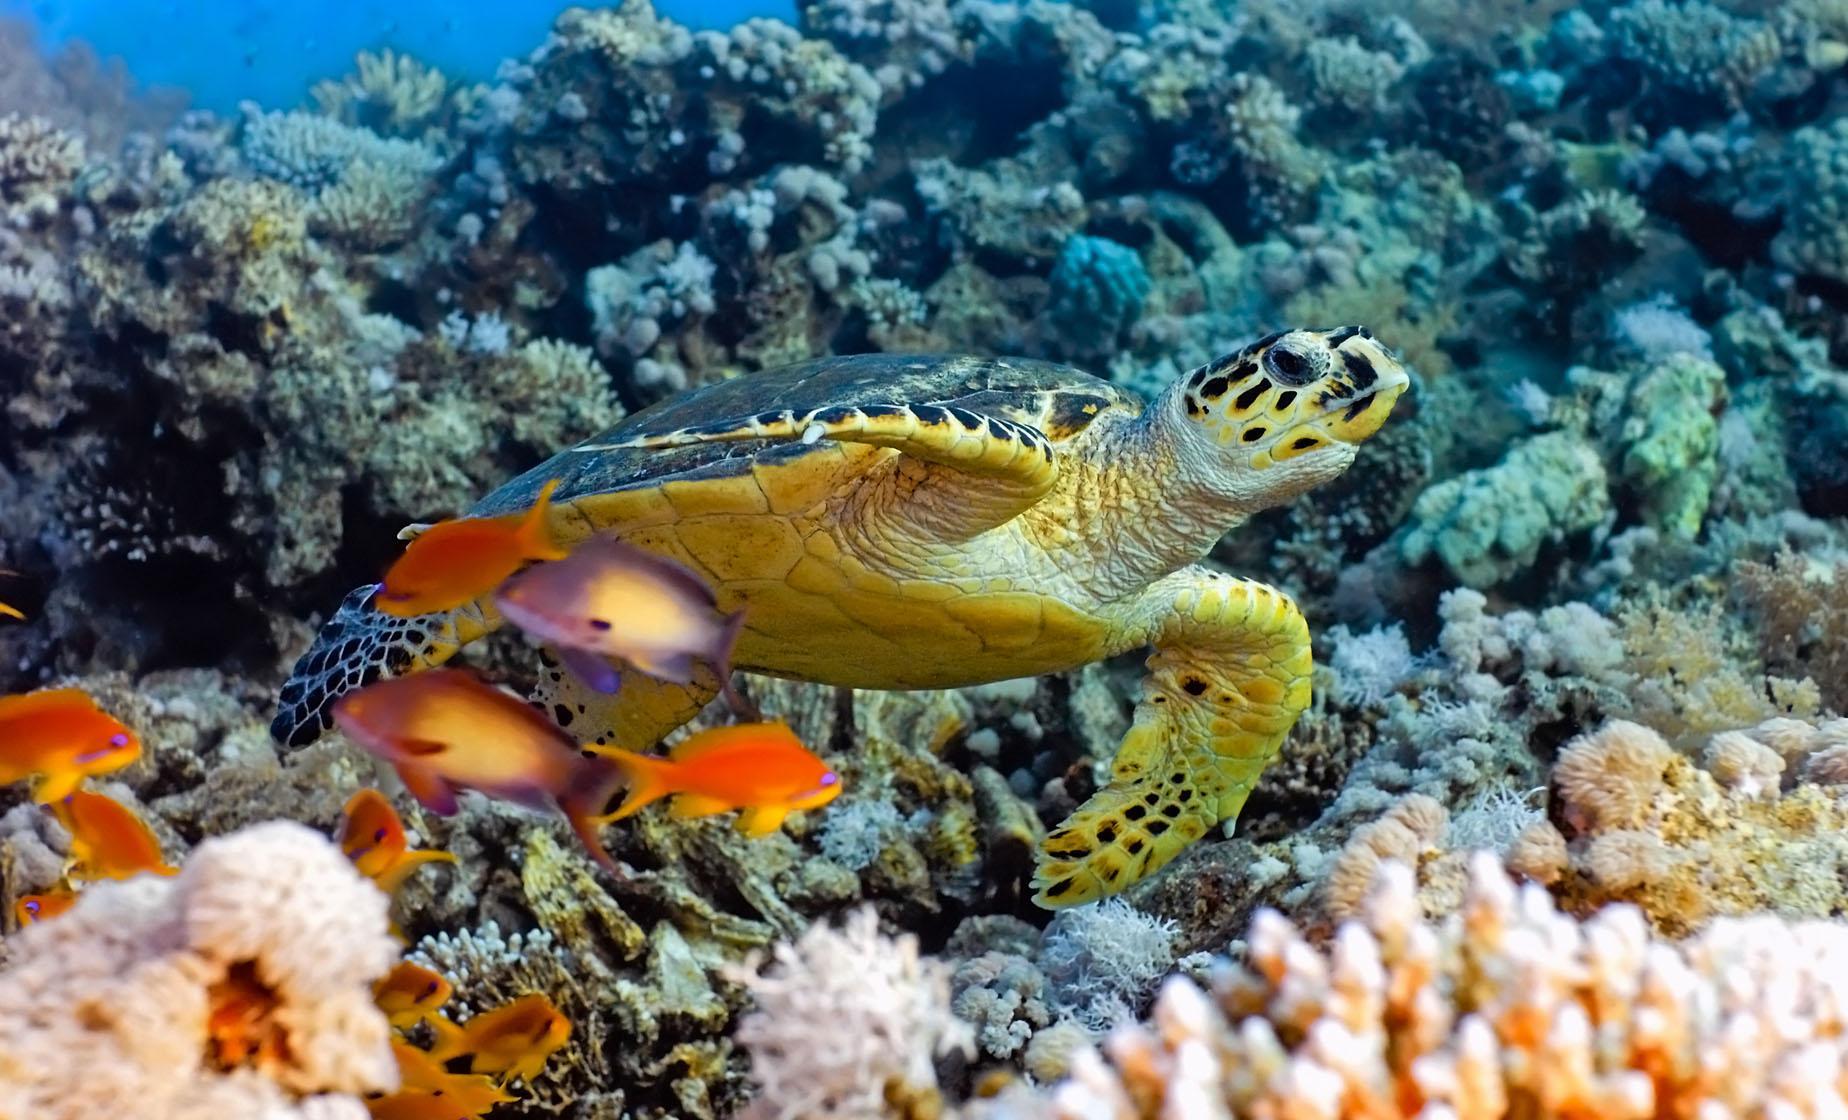 Exclusive Supreme Snorkeling